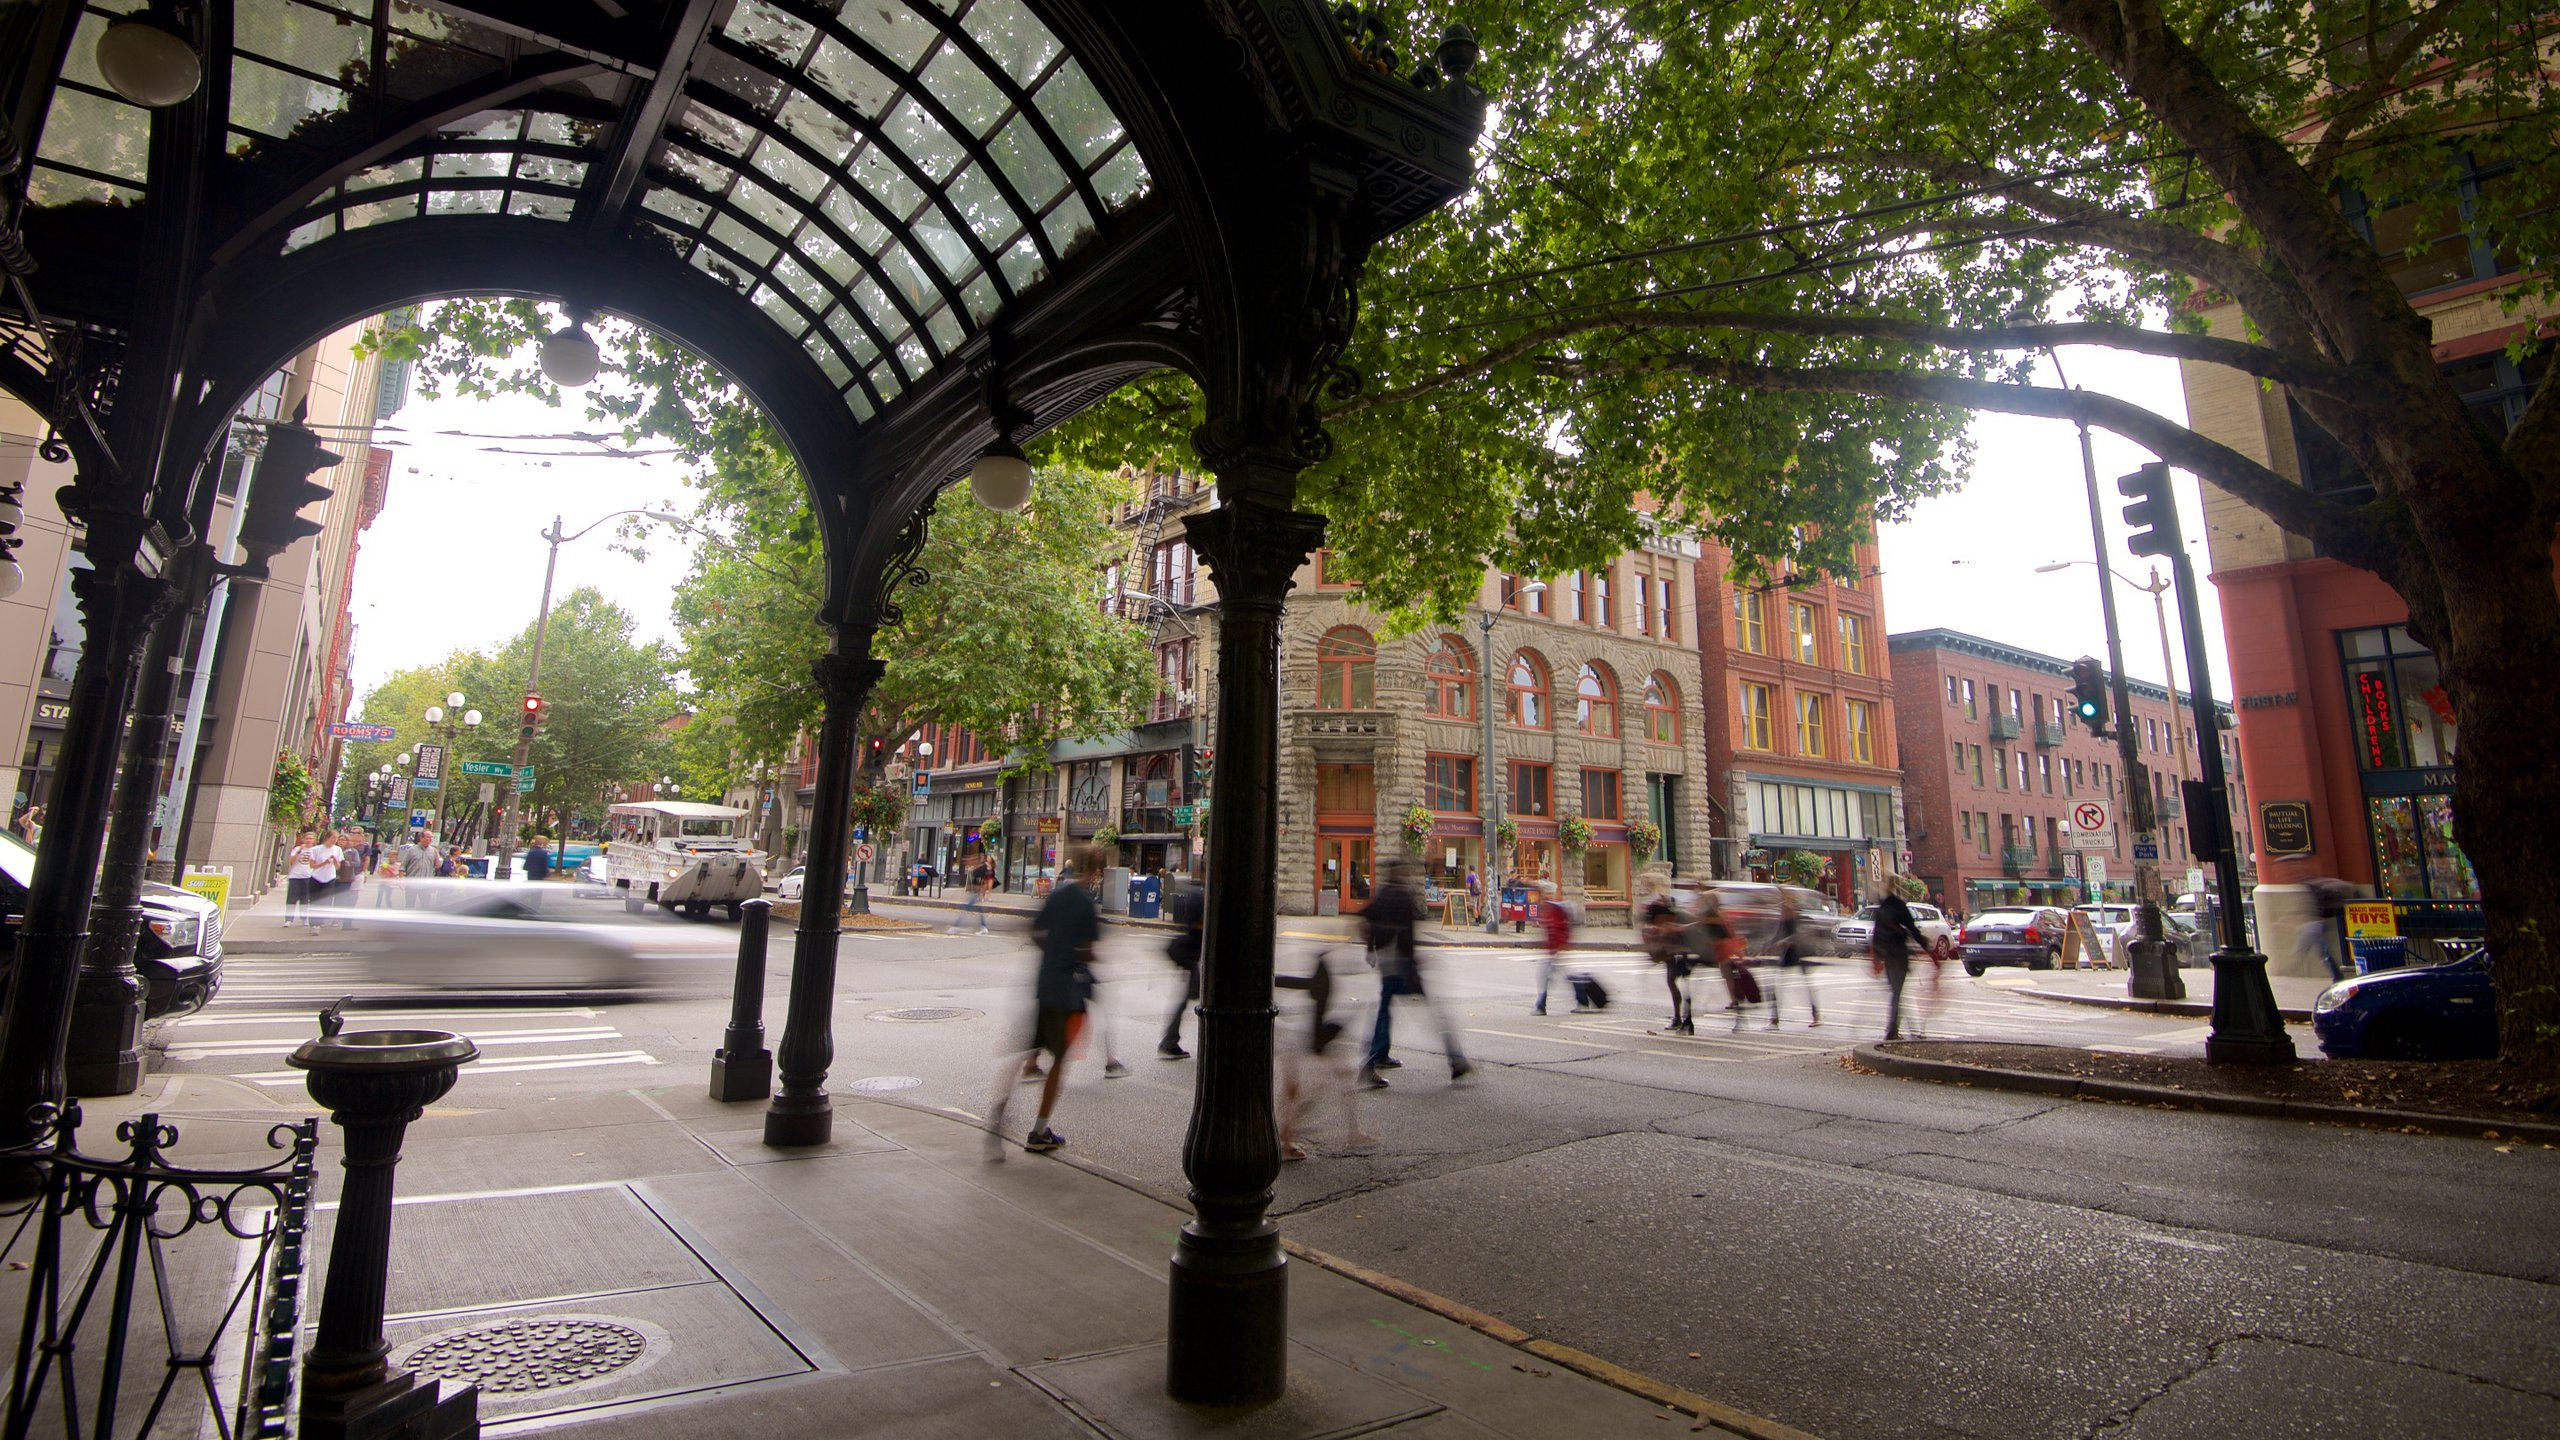 Pioneer Square, Seattle, Washington, United States of America